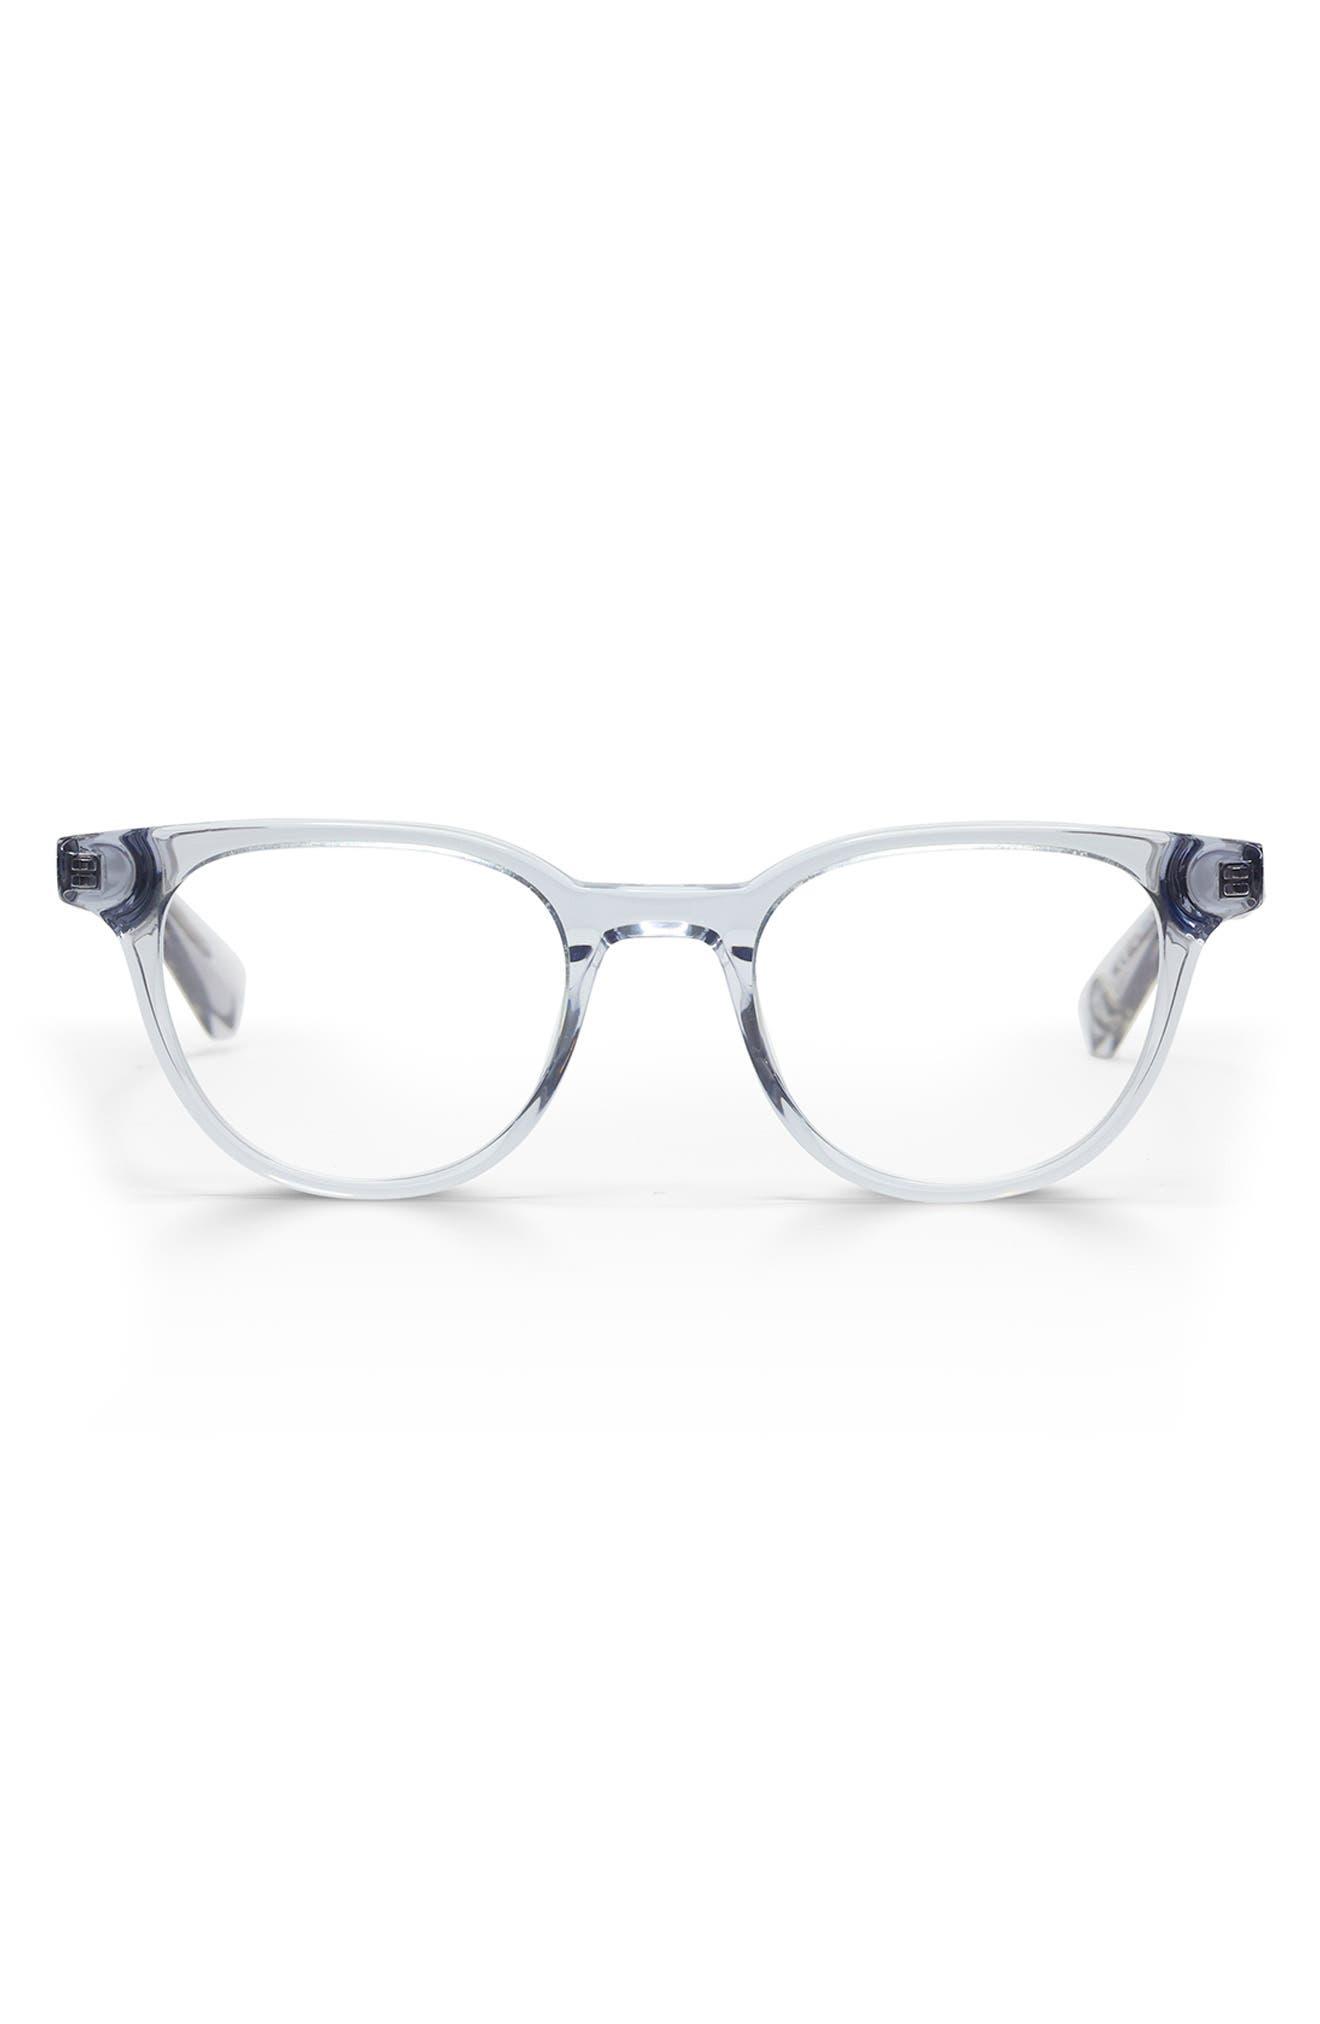 Eleanor 45mm Round Reading Glasses